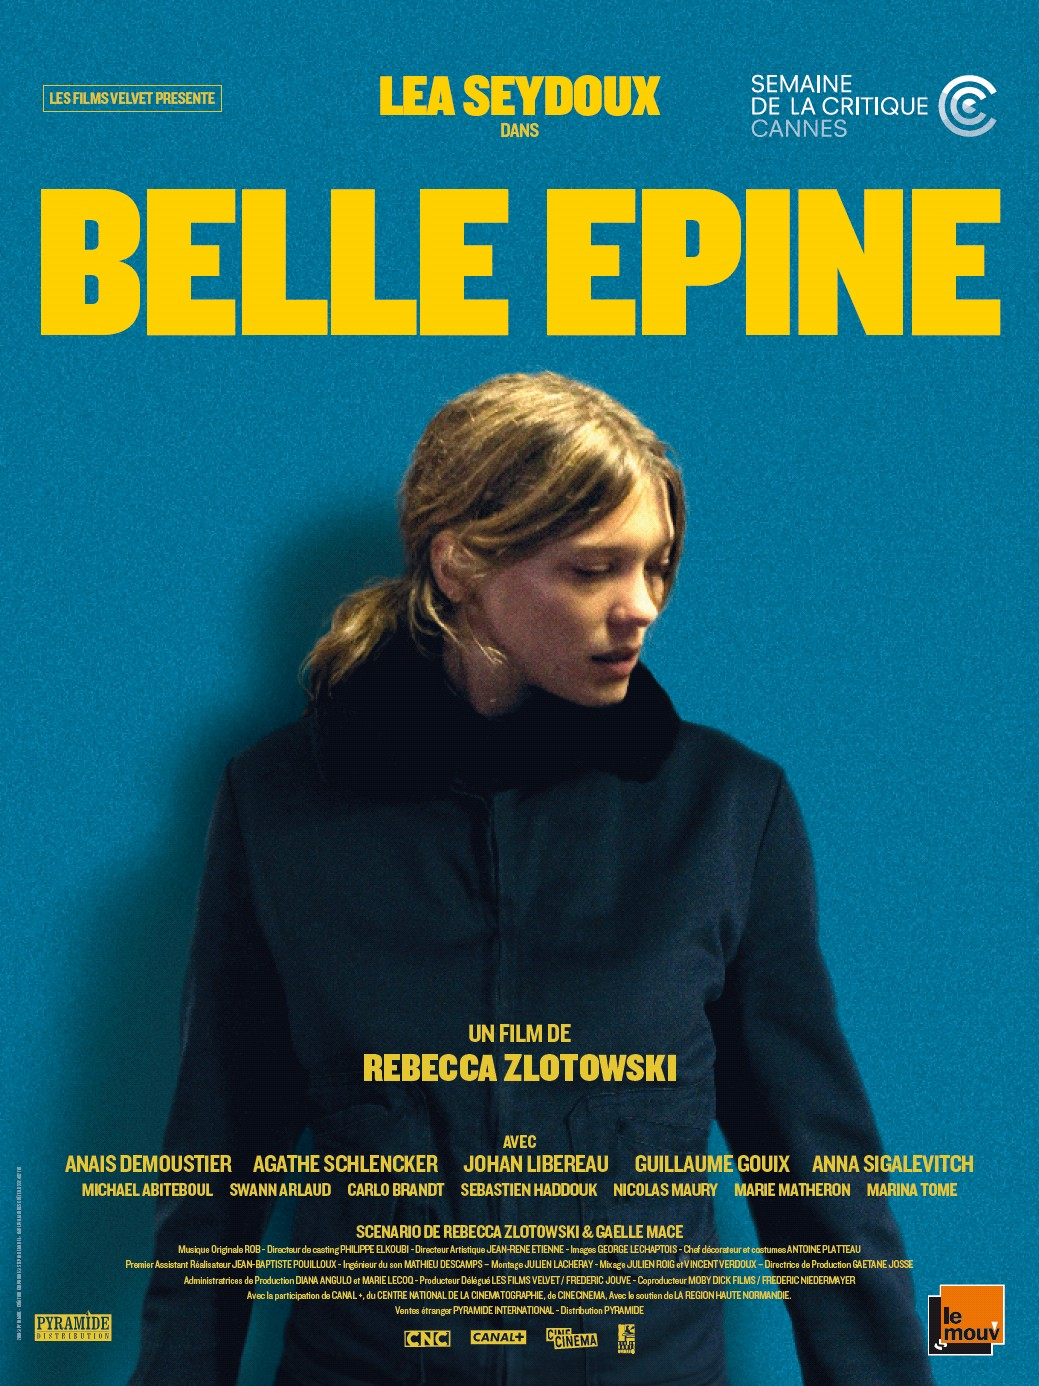 affiche-film-belle-epine-Rebecca-Zlotowski-2009-L%25C3%25A9a-Seydoux-www.lylybye.blogspot.com dans Cinéma